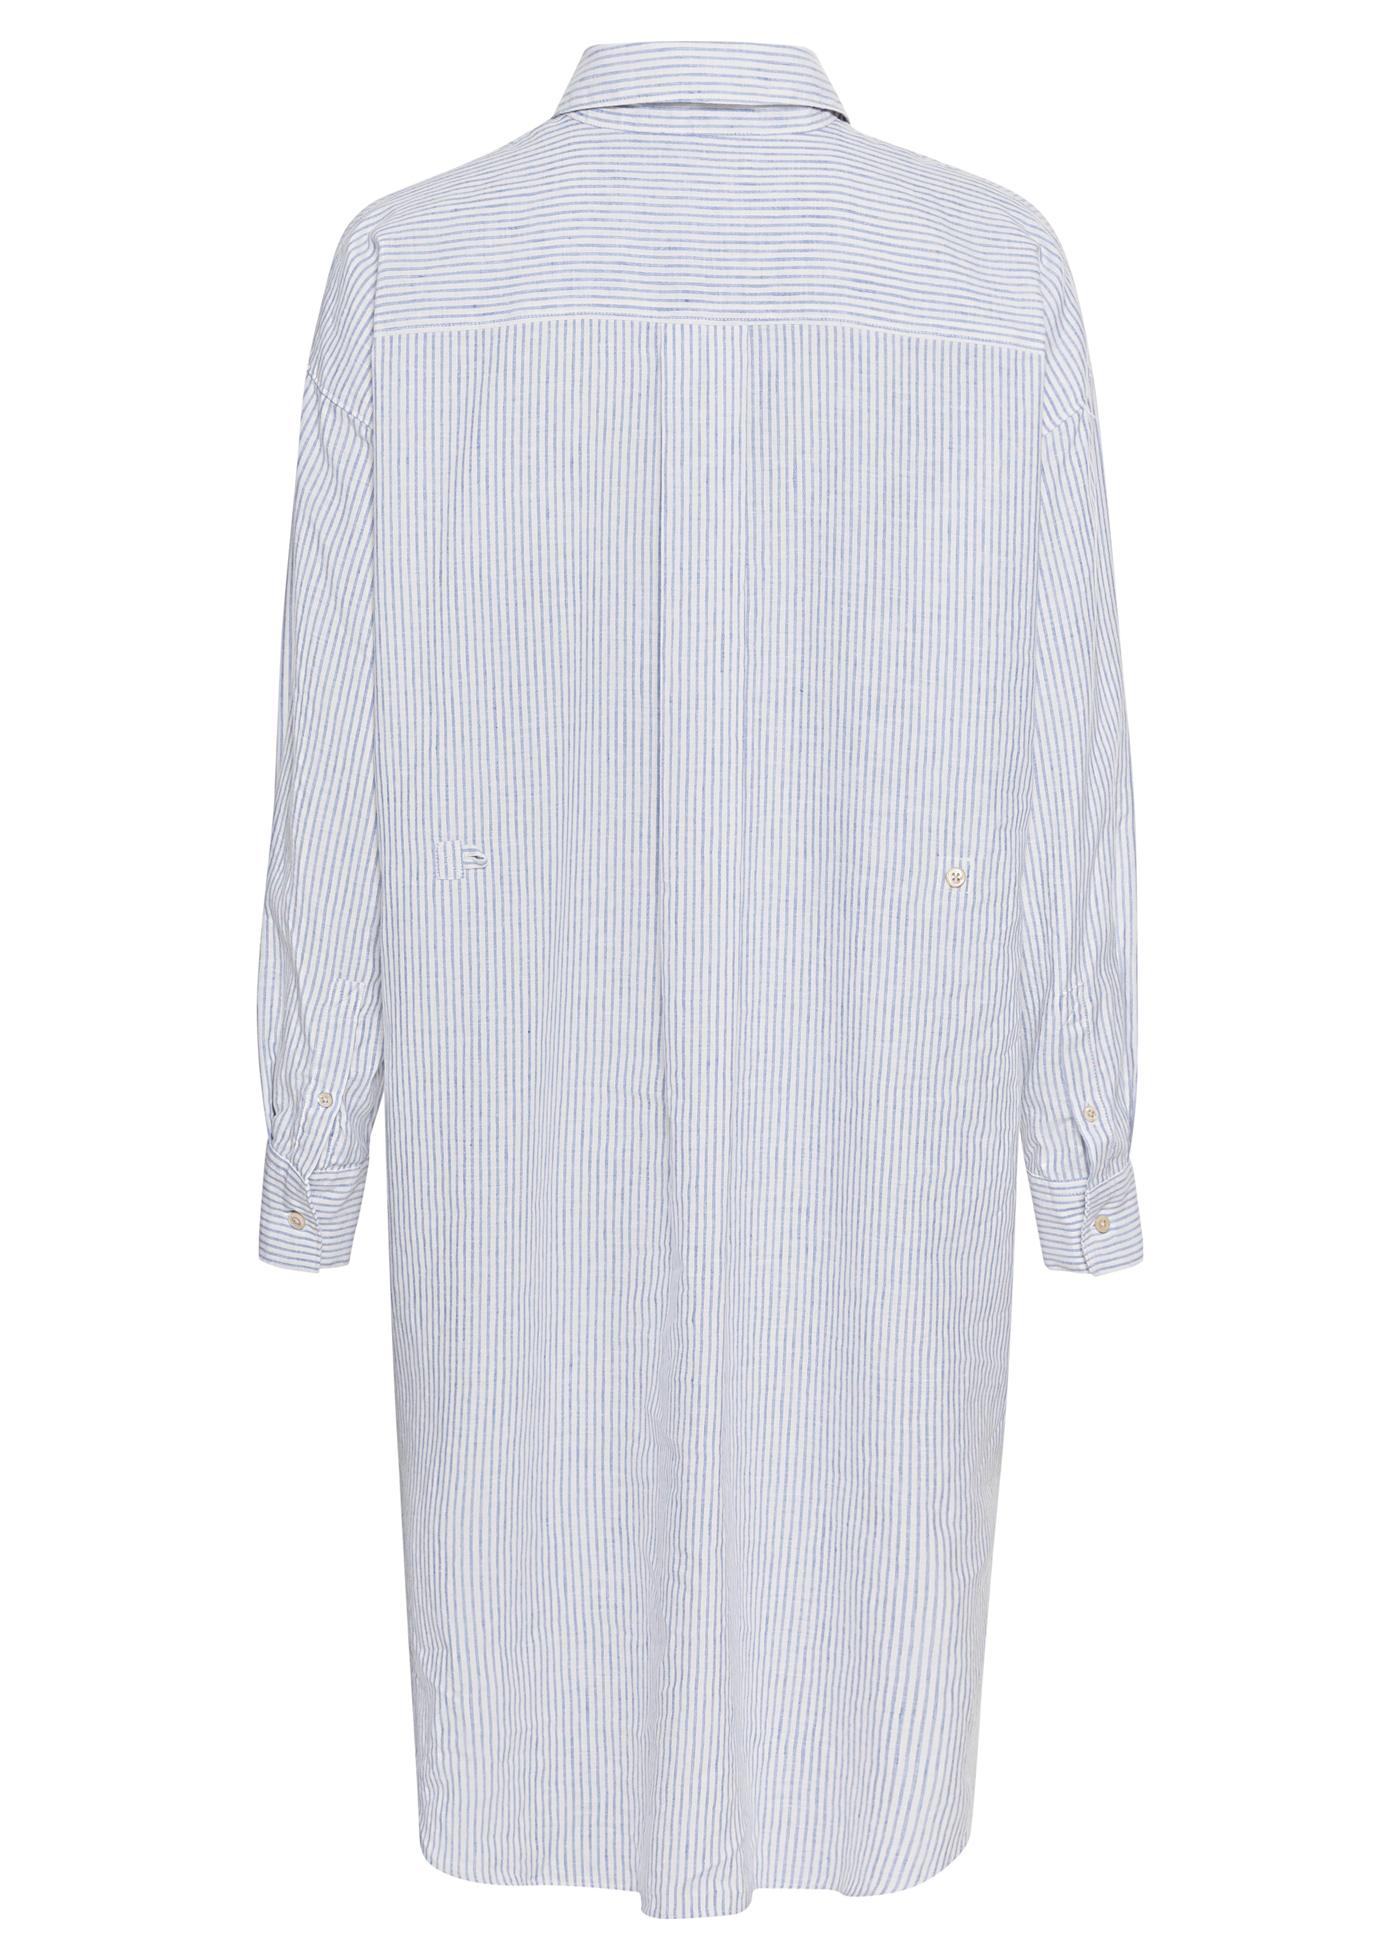 Dress SEEN image number 1